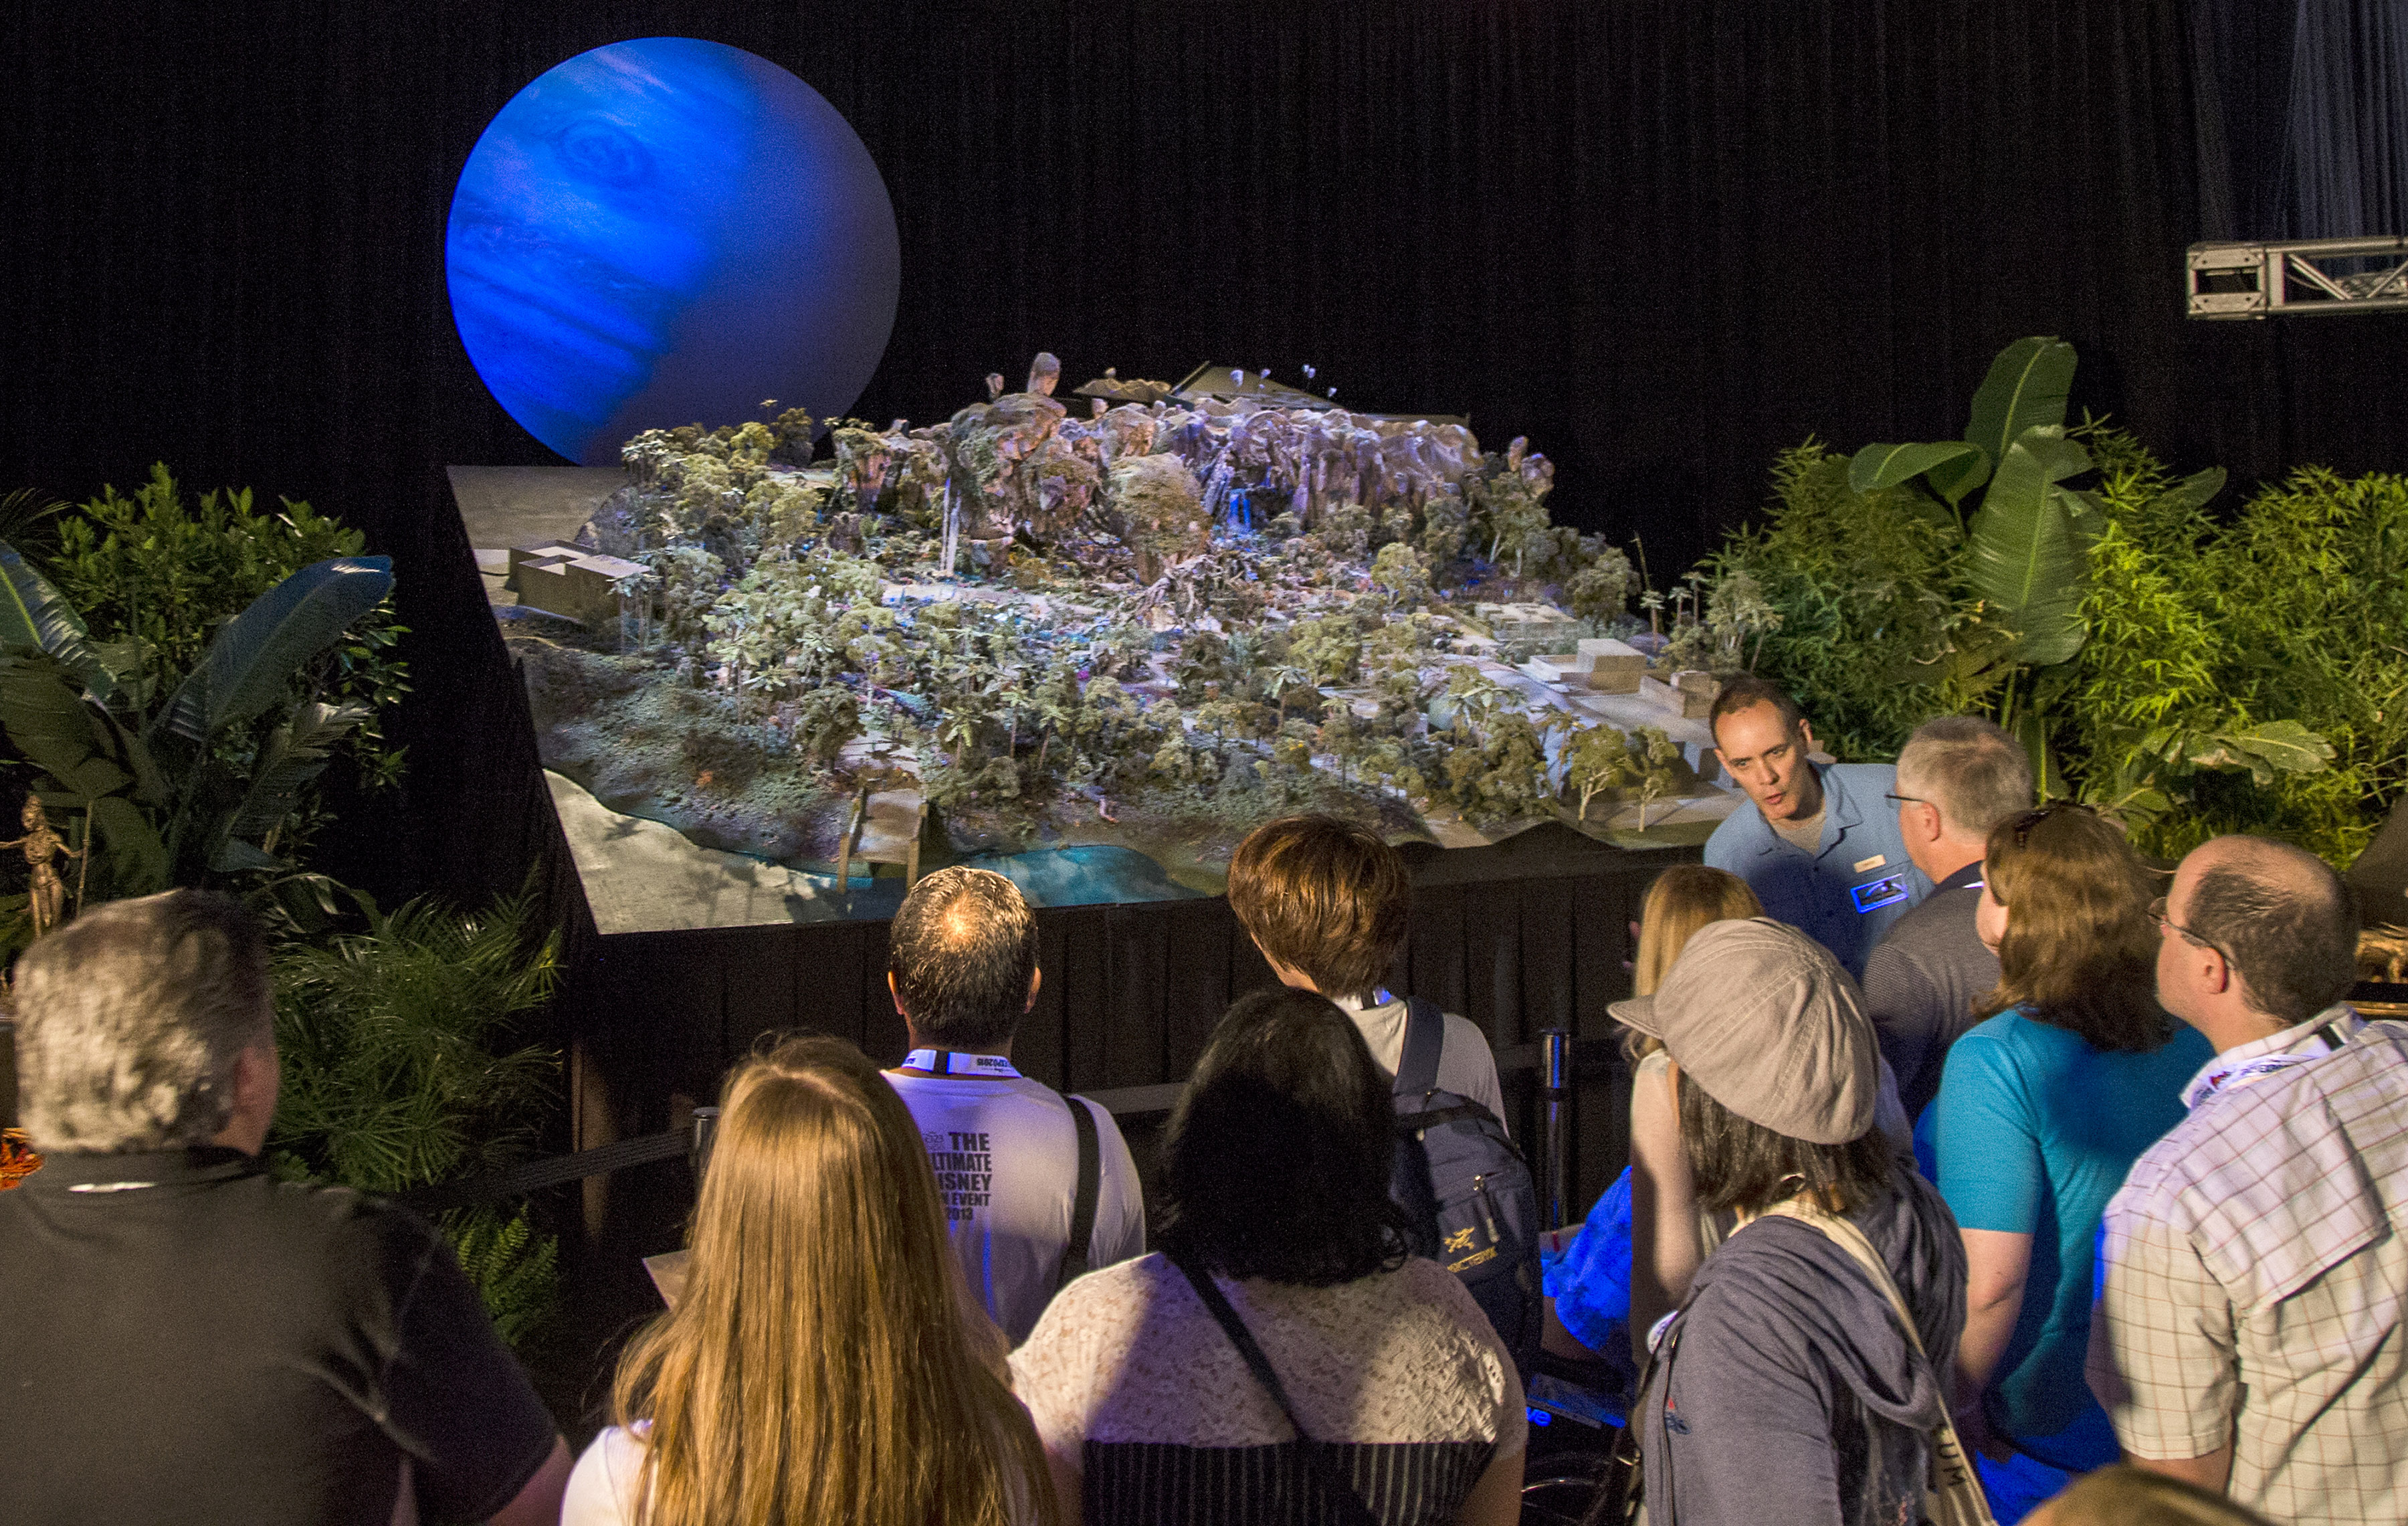 AVATAR model at D23 EXPO 2015